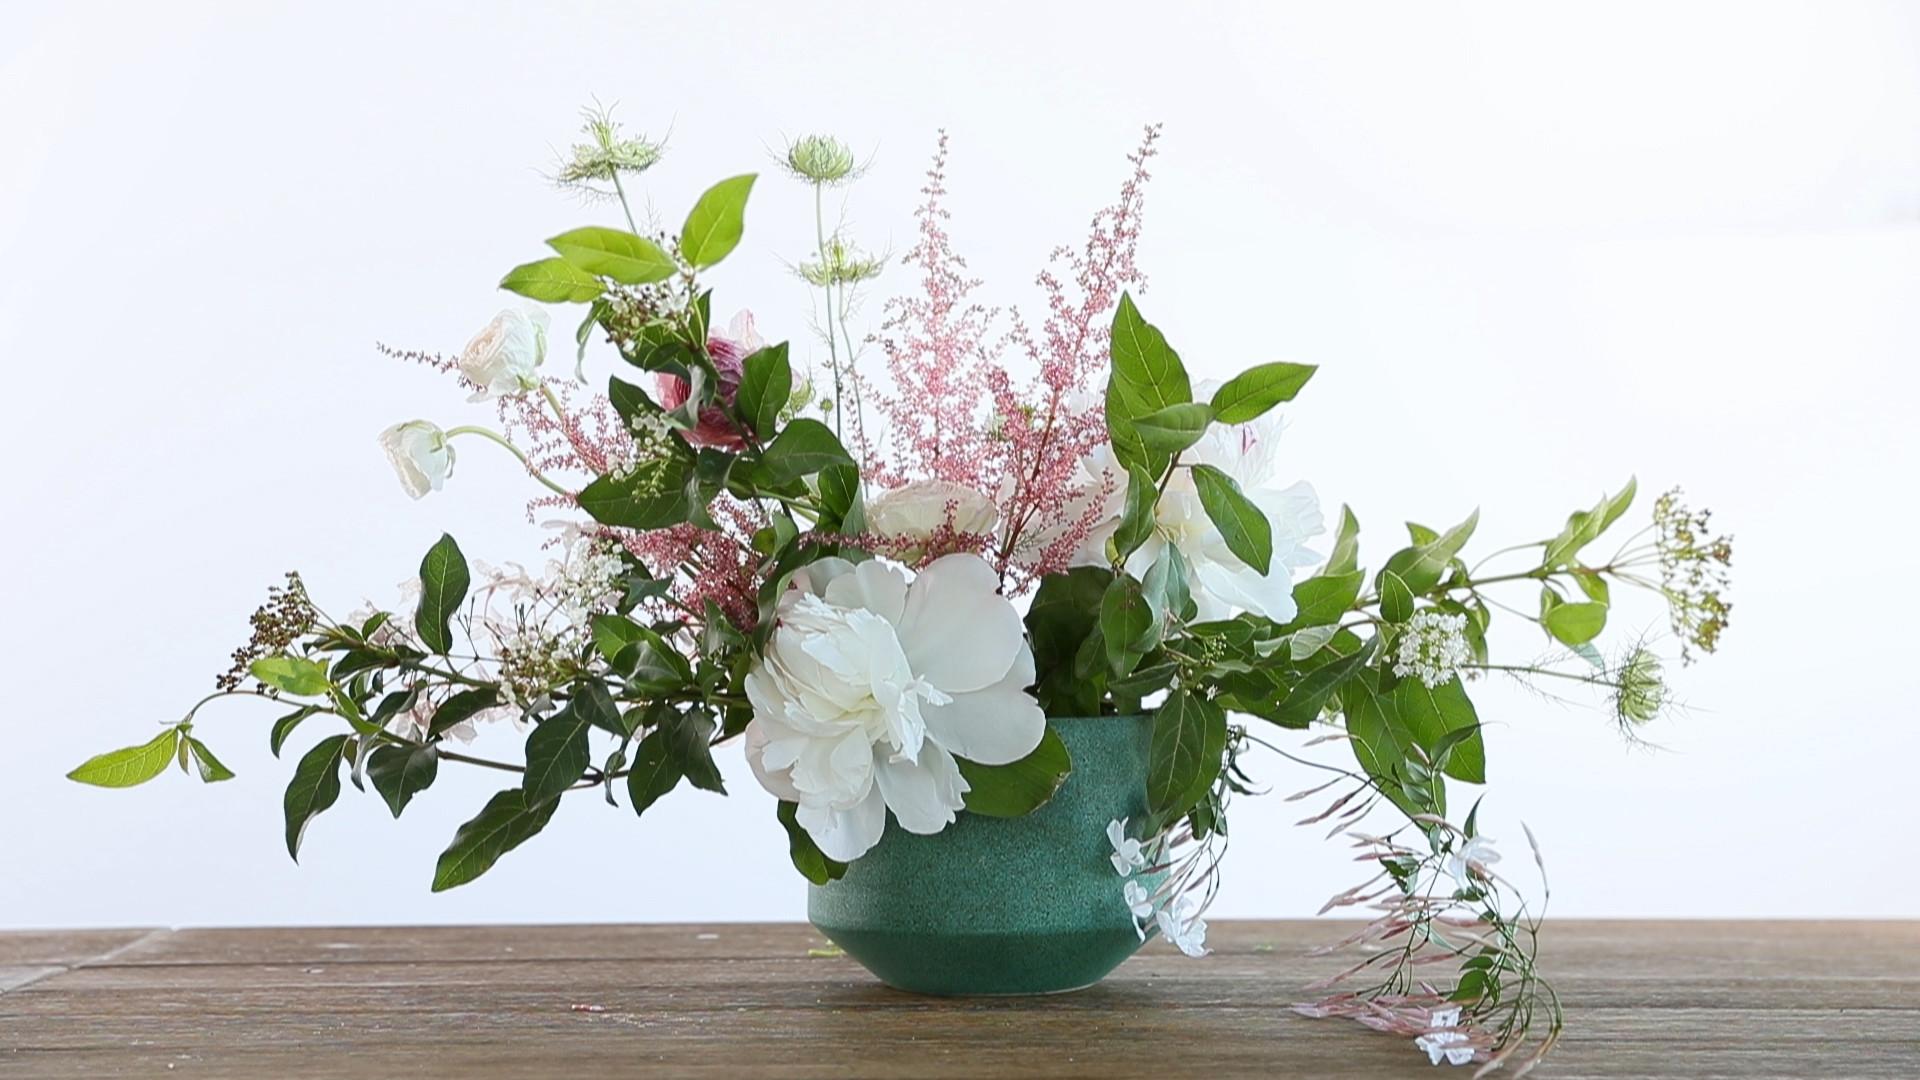 Res: 1920x1080, DIY Spring Flower Arrangement